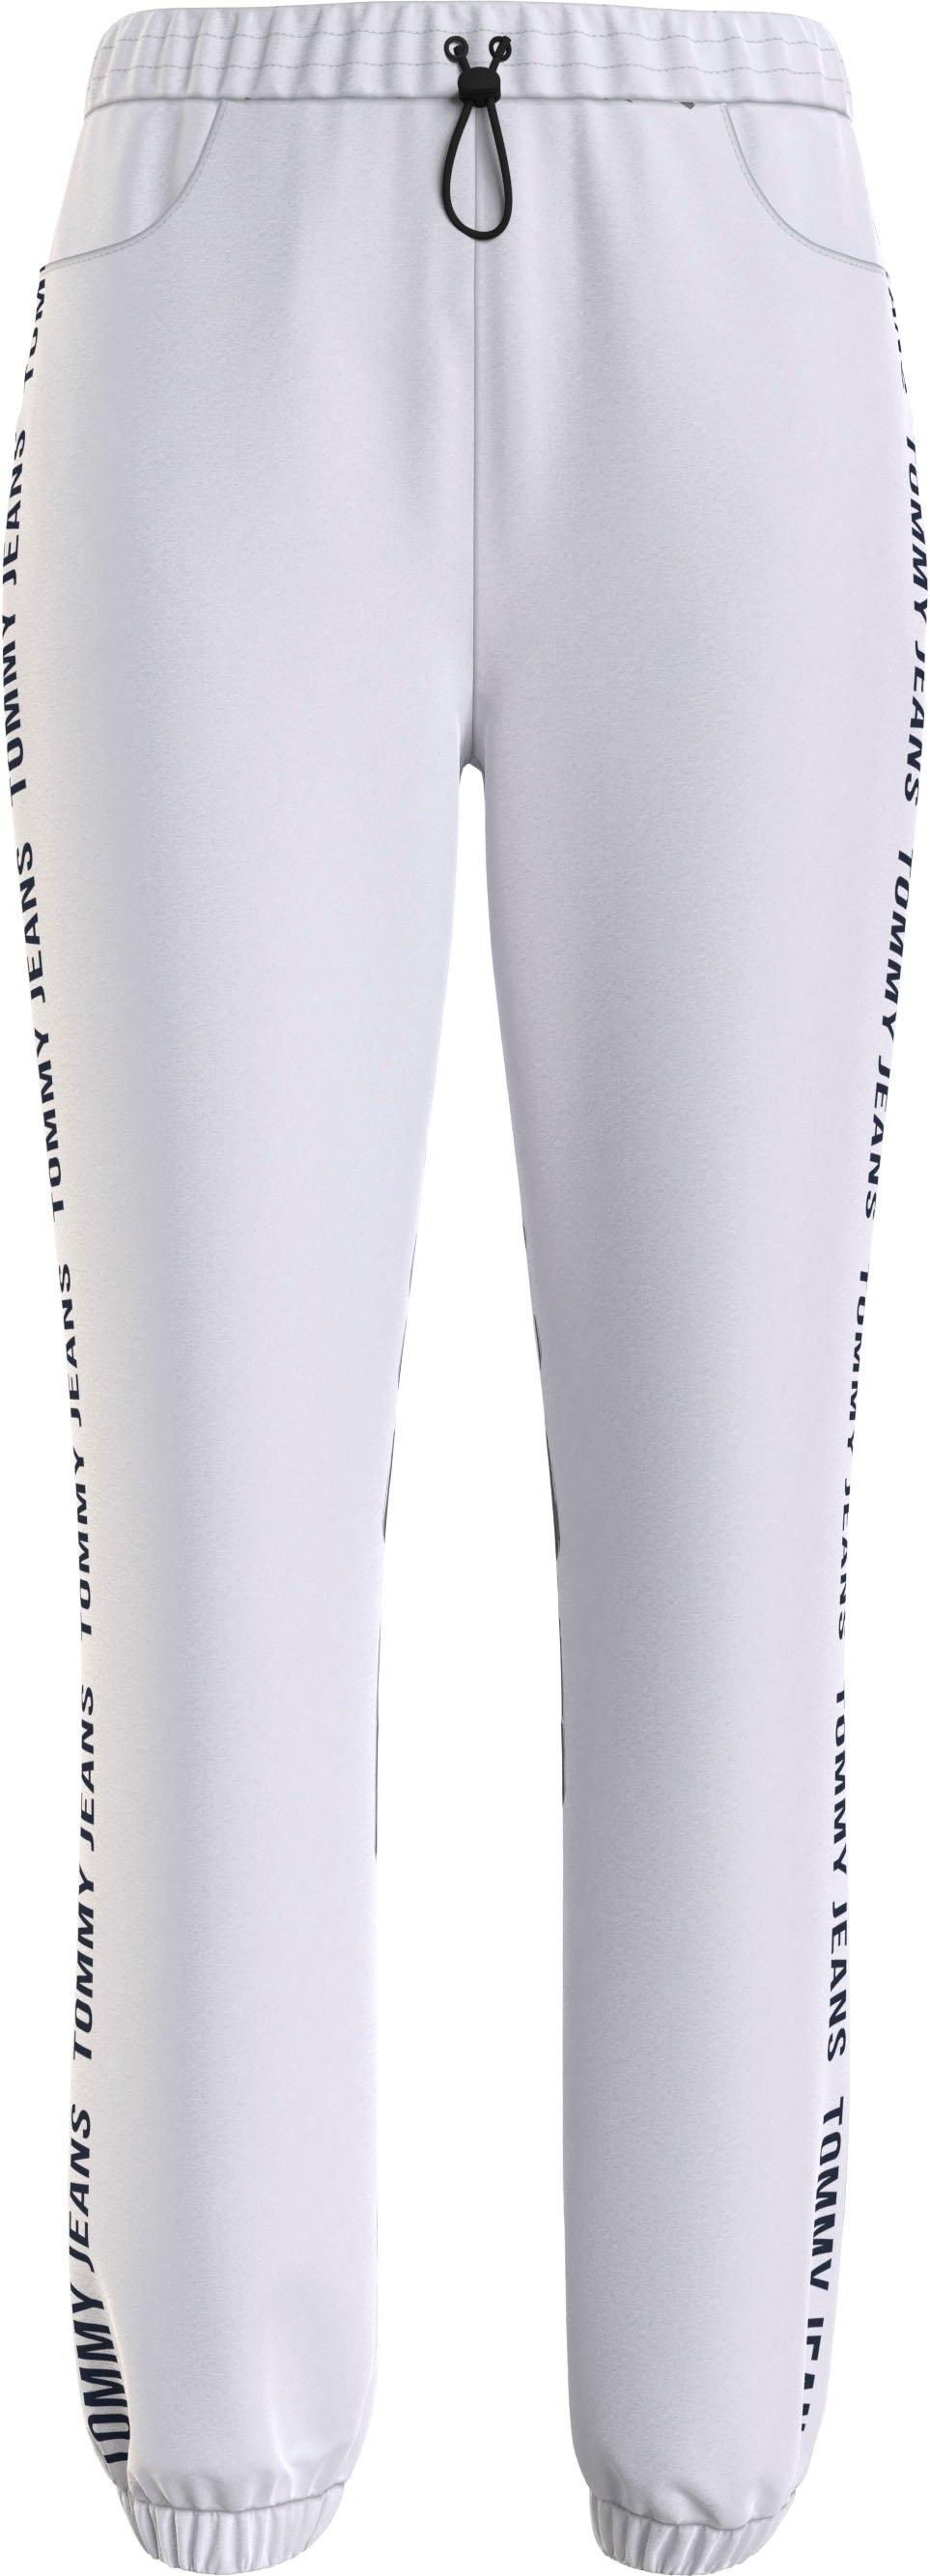 TOMMY JEANS joggingbroek TJW JOGGER TAPE RELAXED met tommy jeans-logo-opschrift opzij op de pijpen nu online bestellen